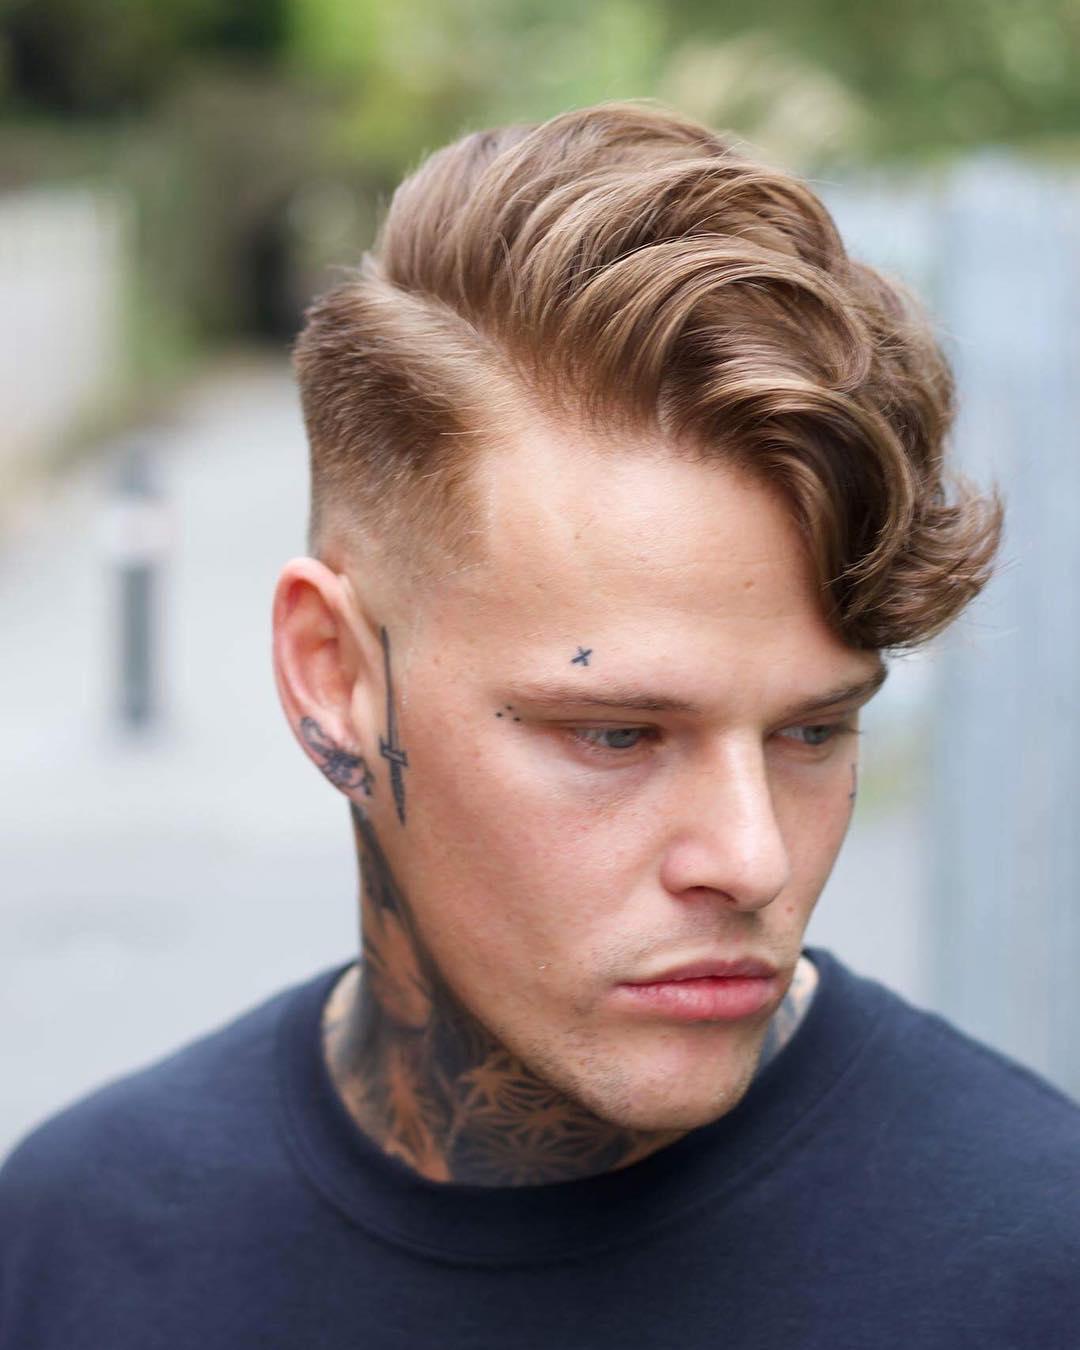 alan_beak low fade and long fringe mens hairstyle